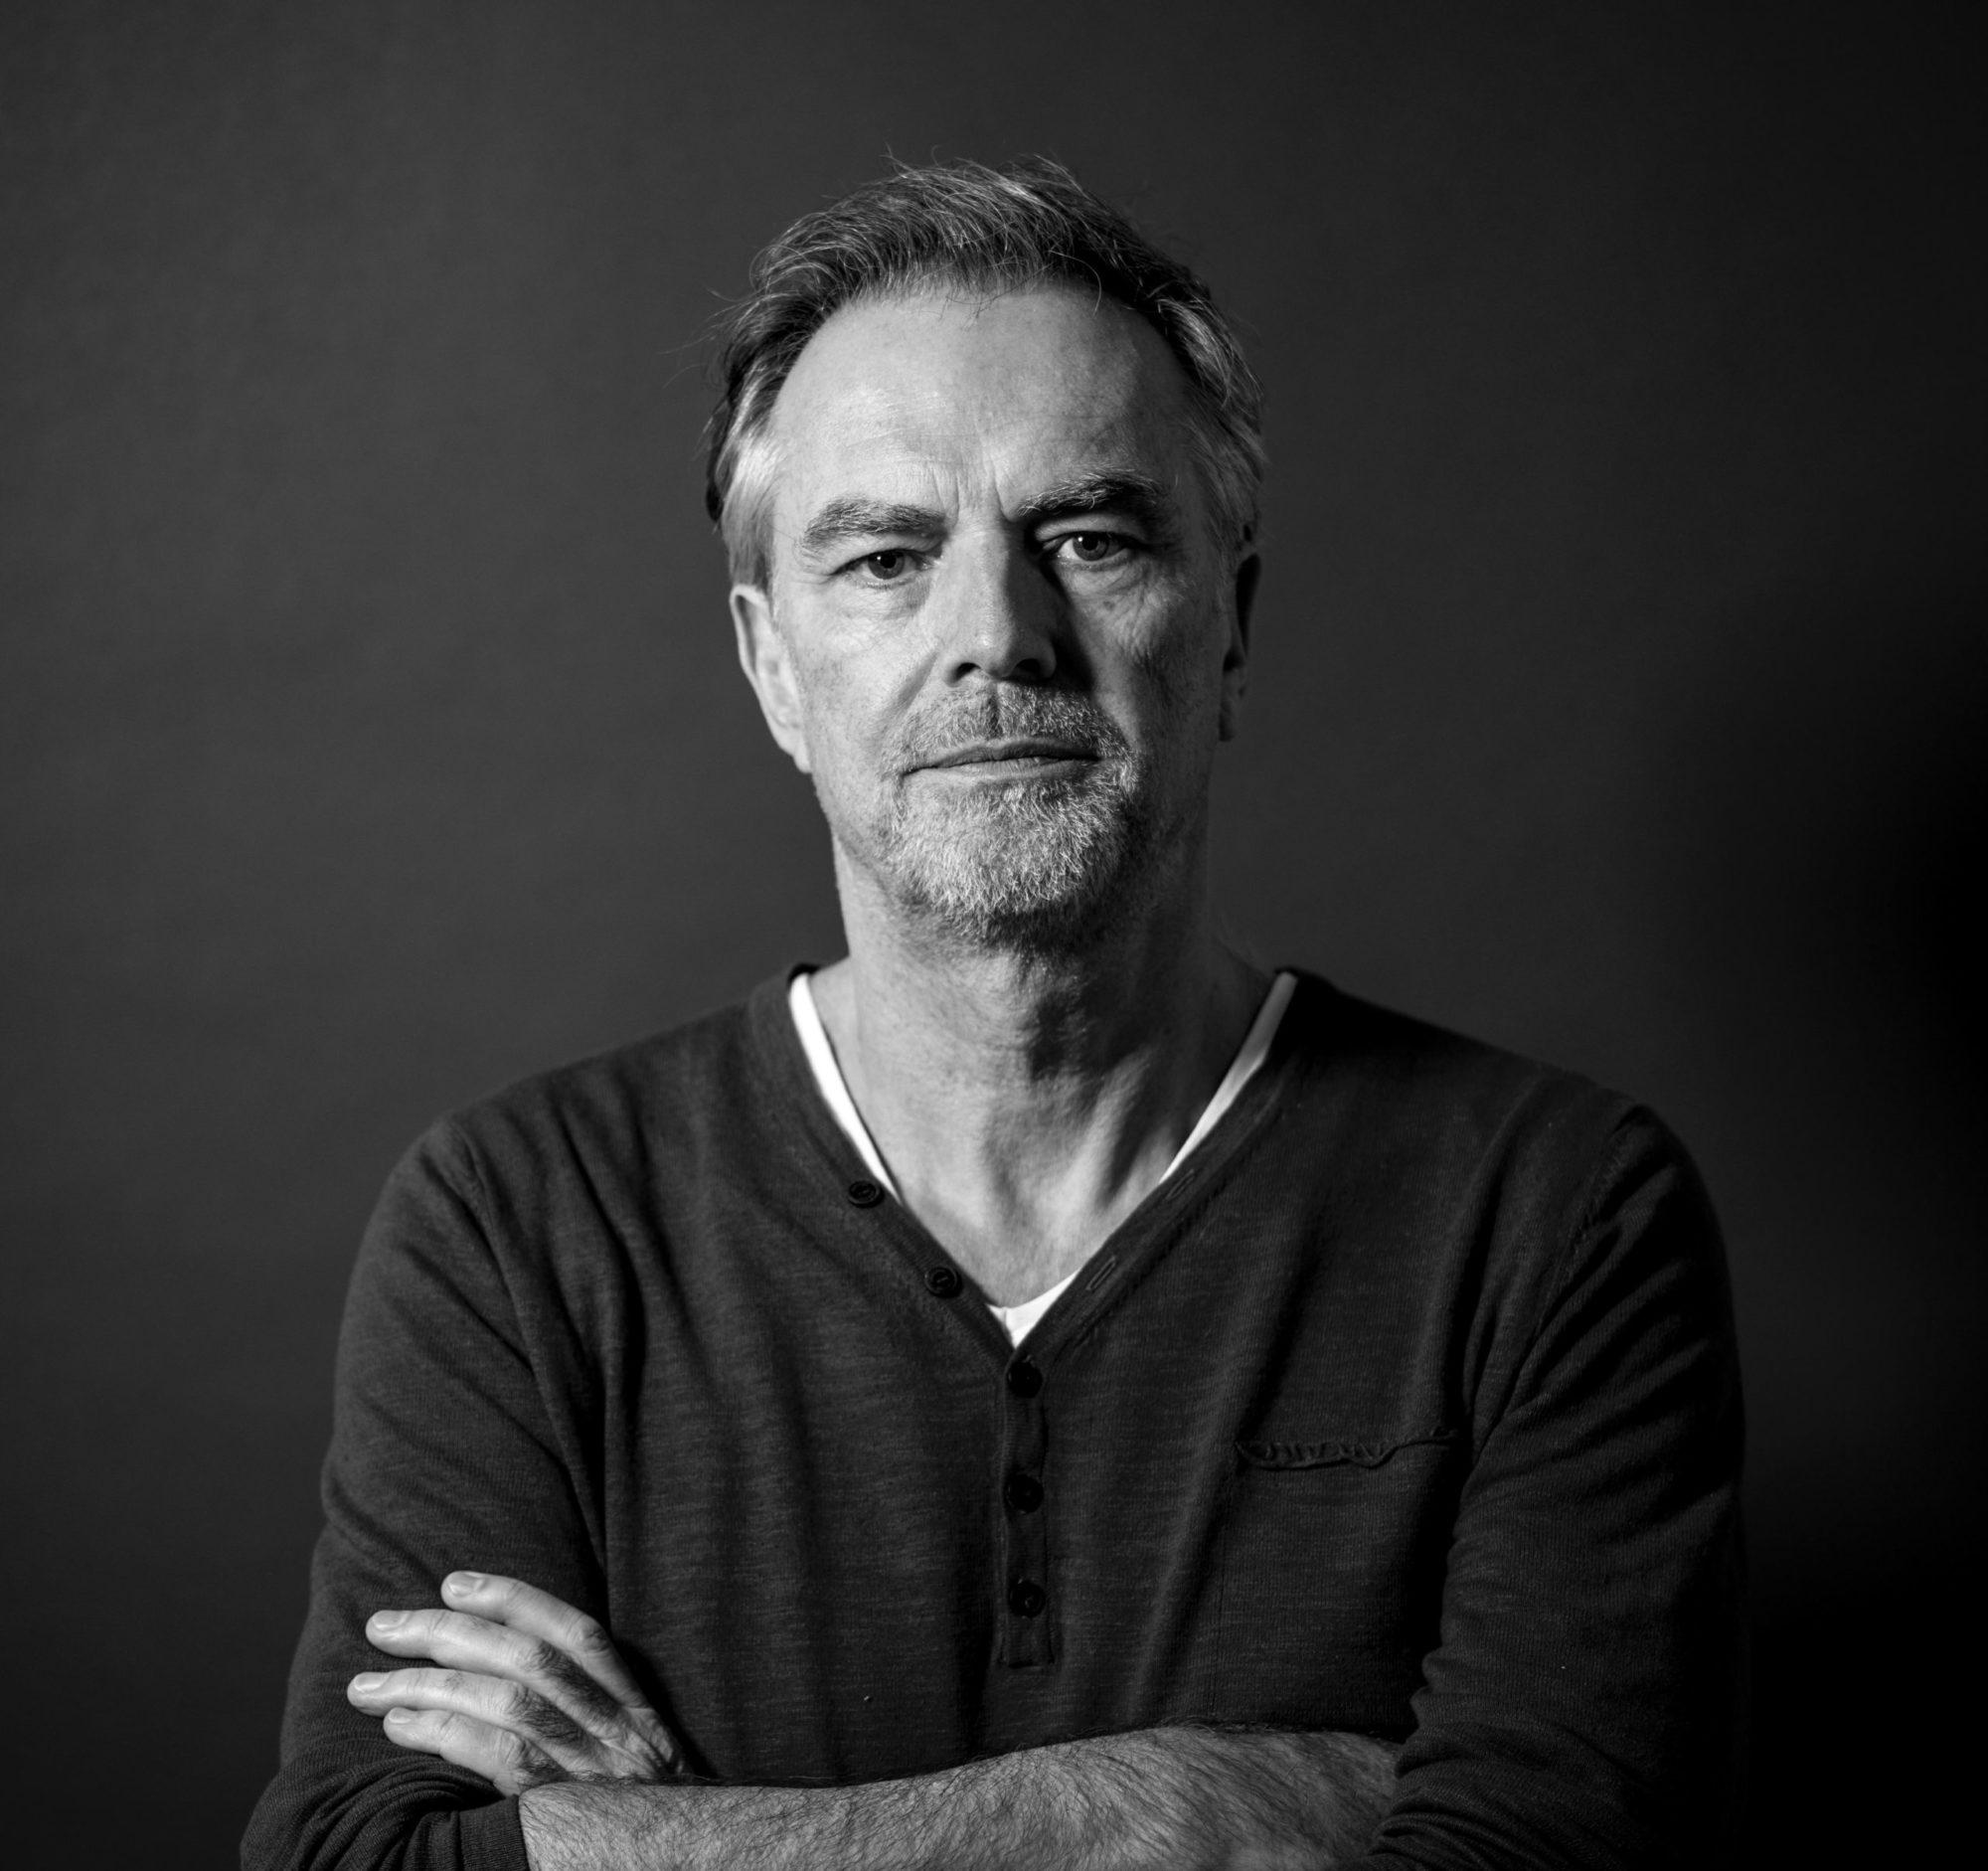 Lars vom Hagen